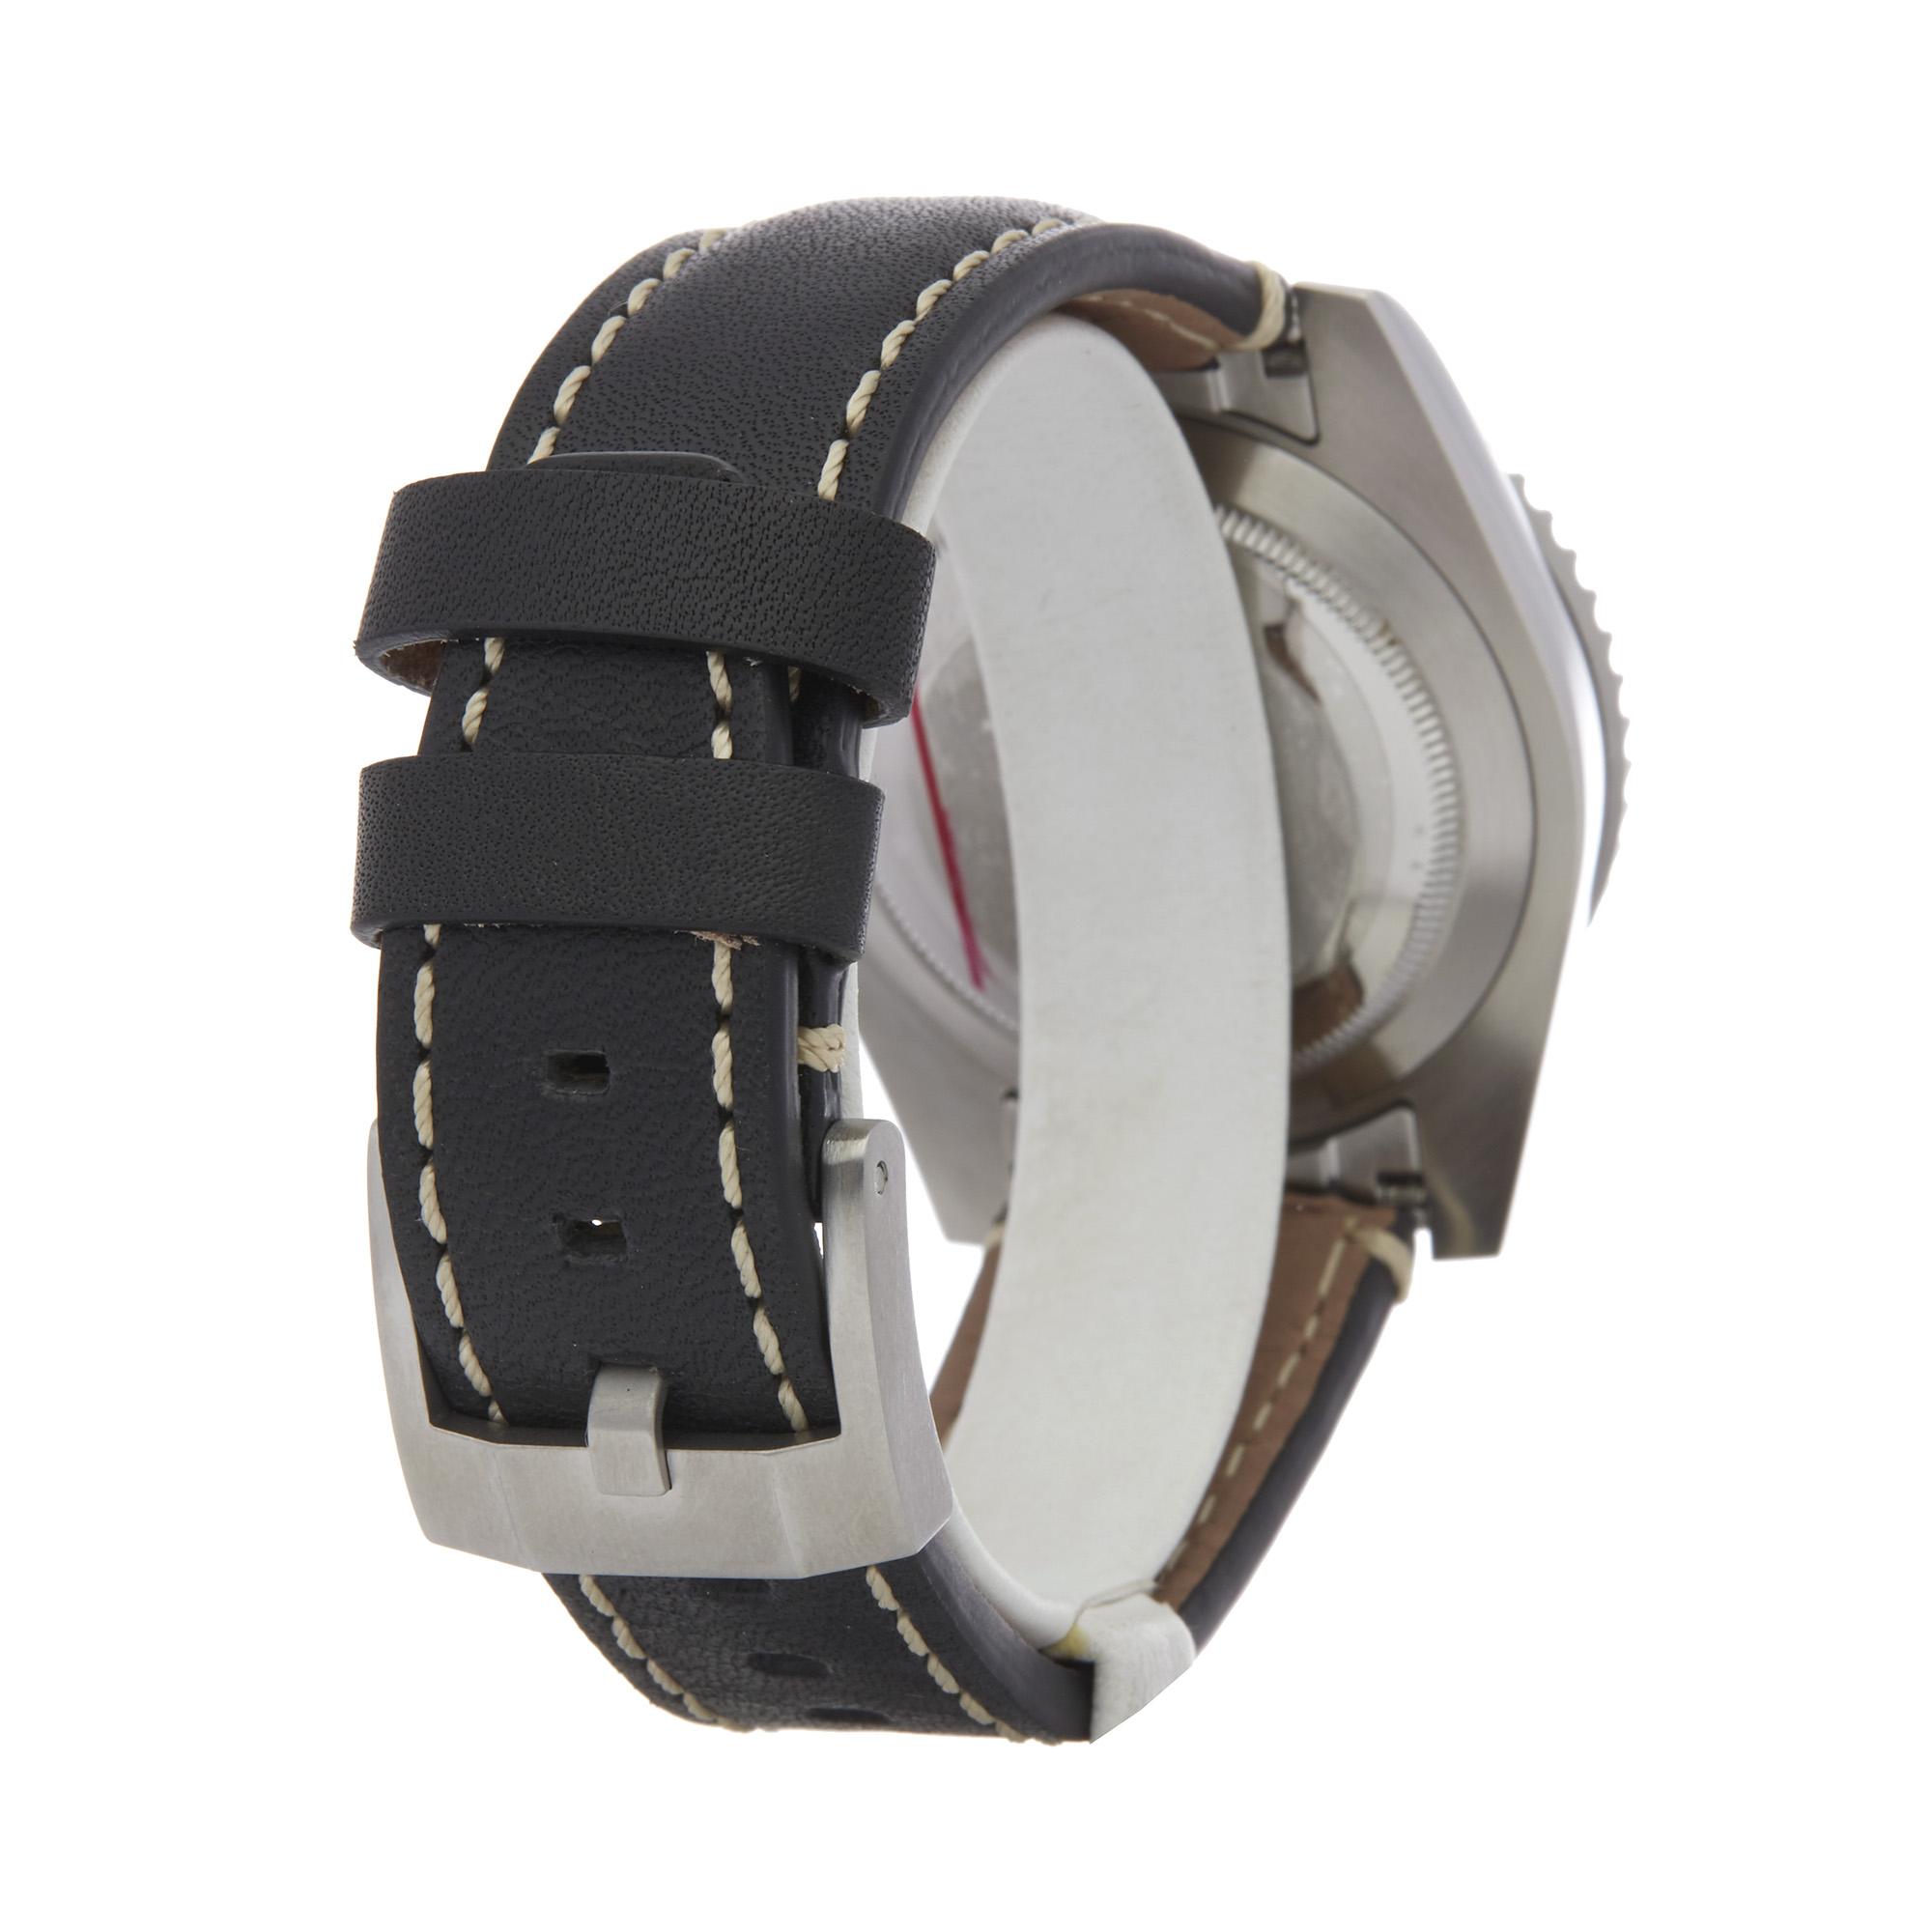 Rolex Submariner No Date 114060 Men Stainless Steel Watch - Image 5 of 8